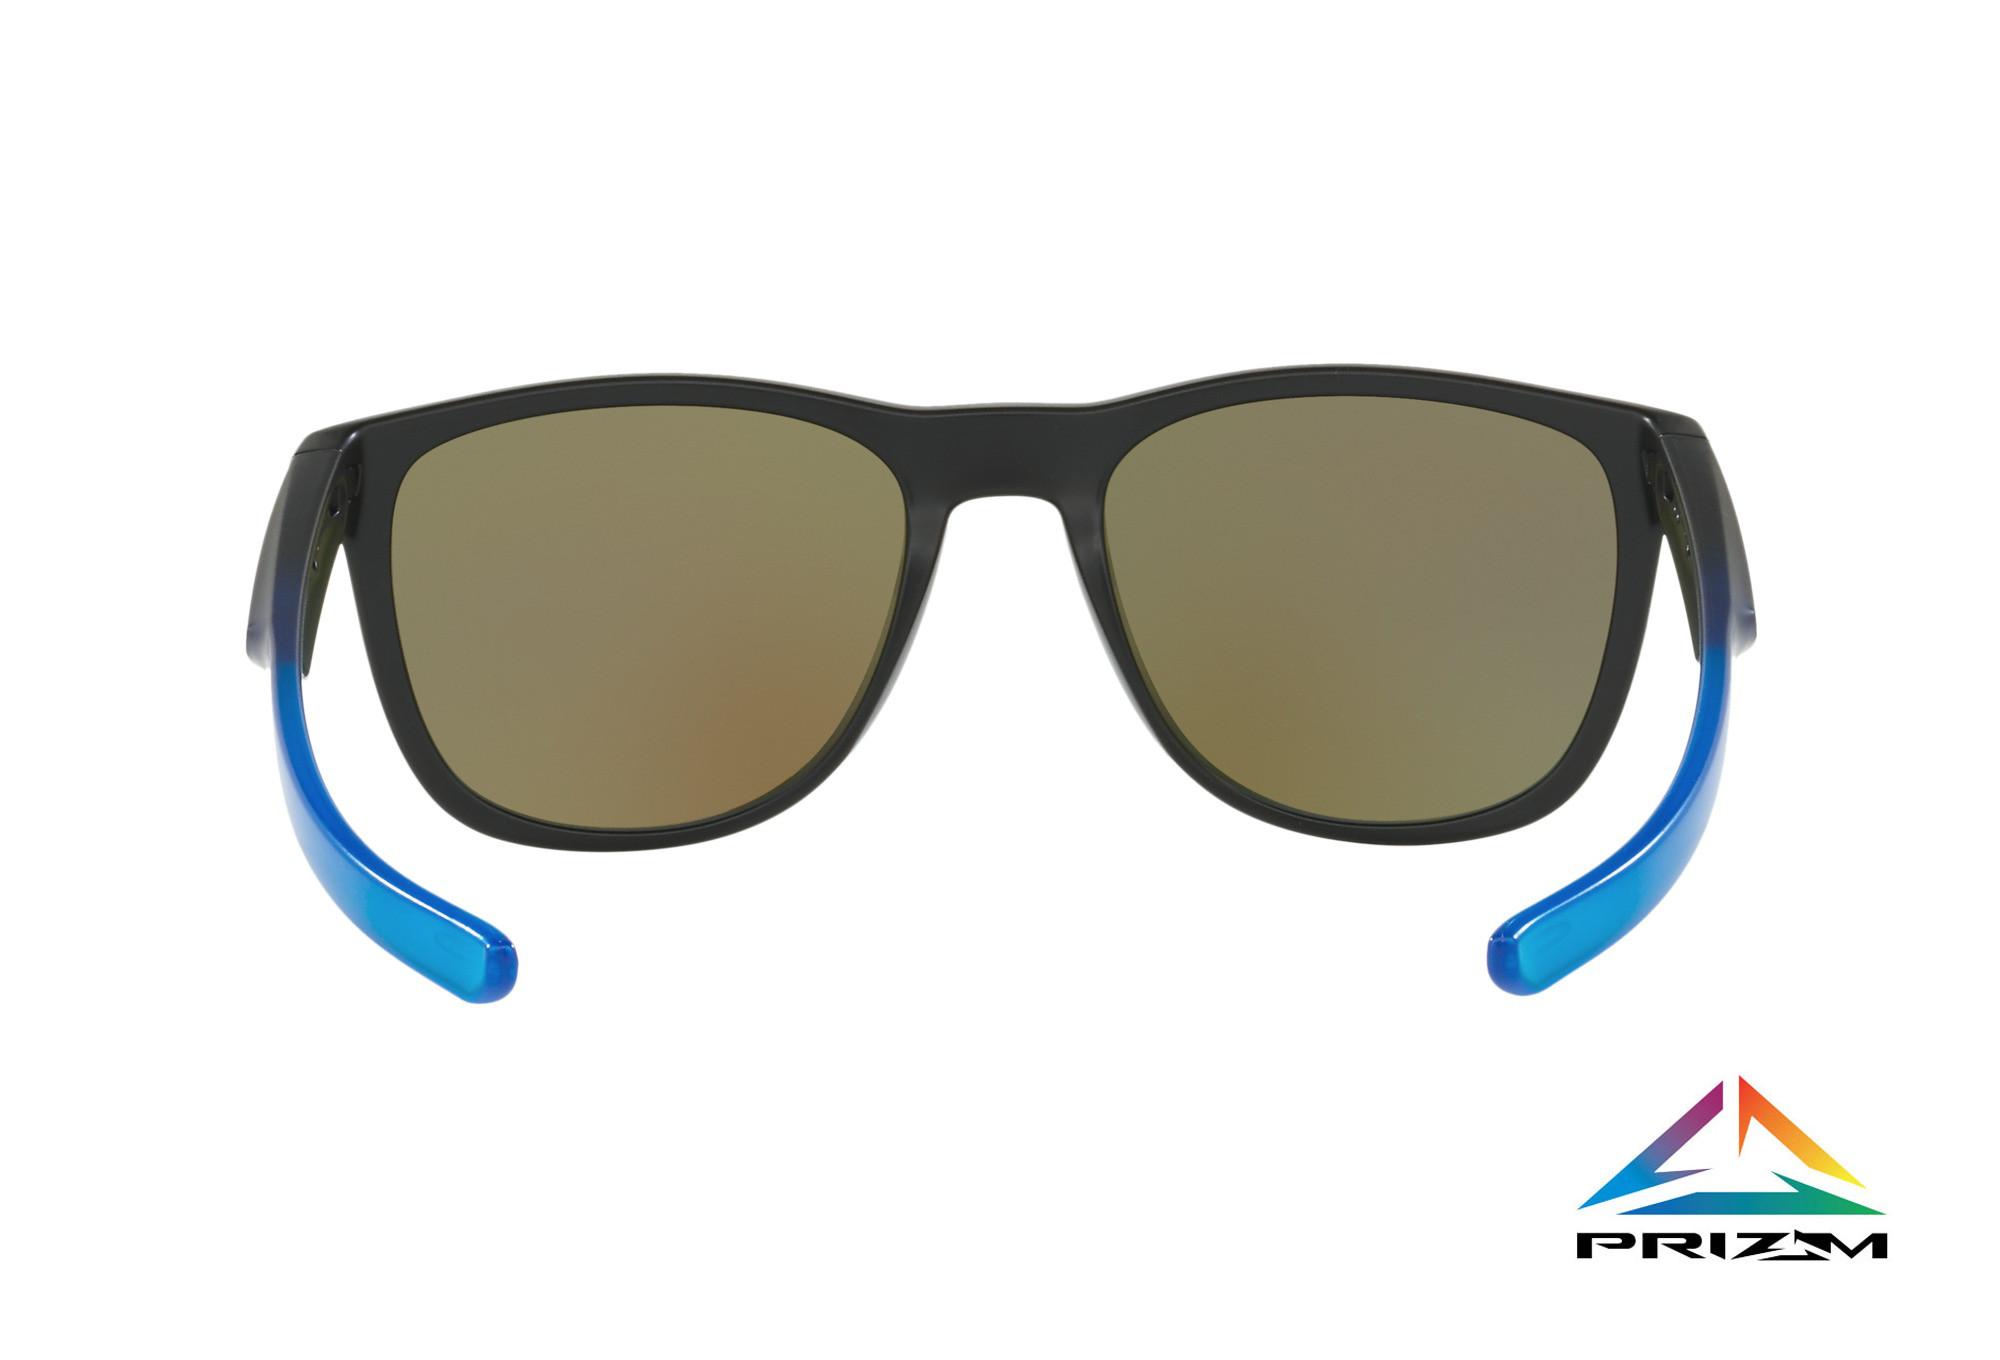 c4b2afd0eef OAKLEY 2017 Sunglasses TRILLBE X Sapphire Fade   Prizm Sapphire Polarized  Ref  OO9340-0952